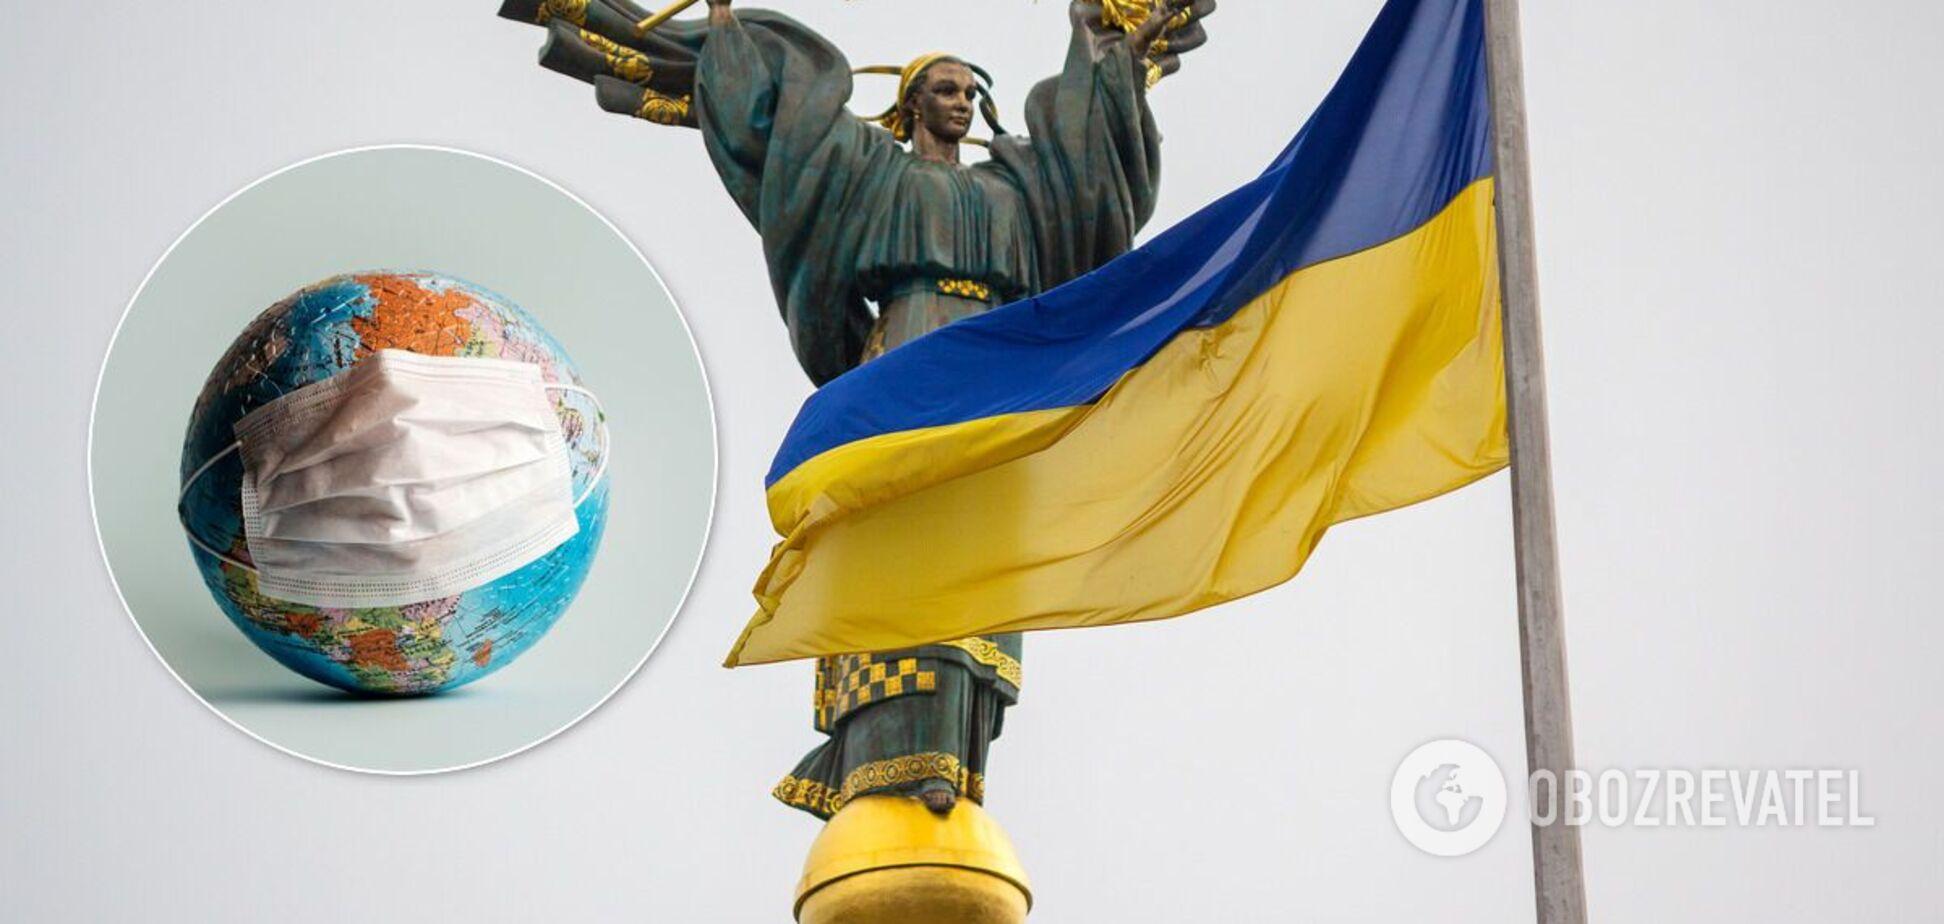 Из-за кухарок у власти Украина лидирует по смертности от COVID-19 в Европе